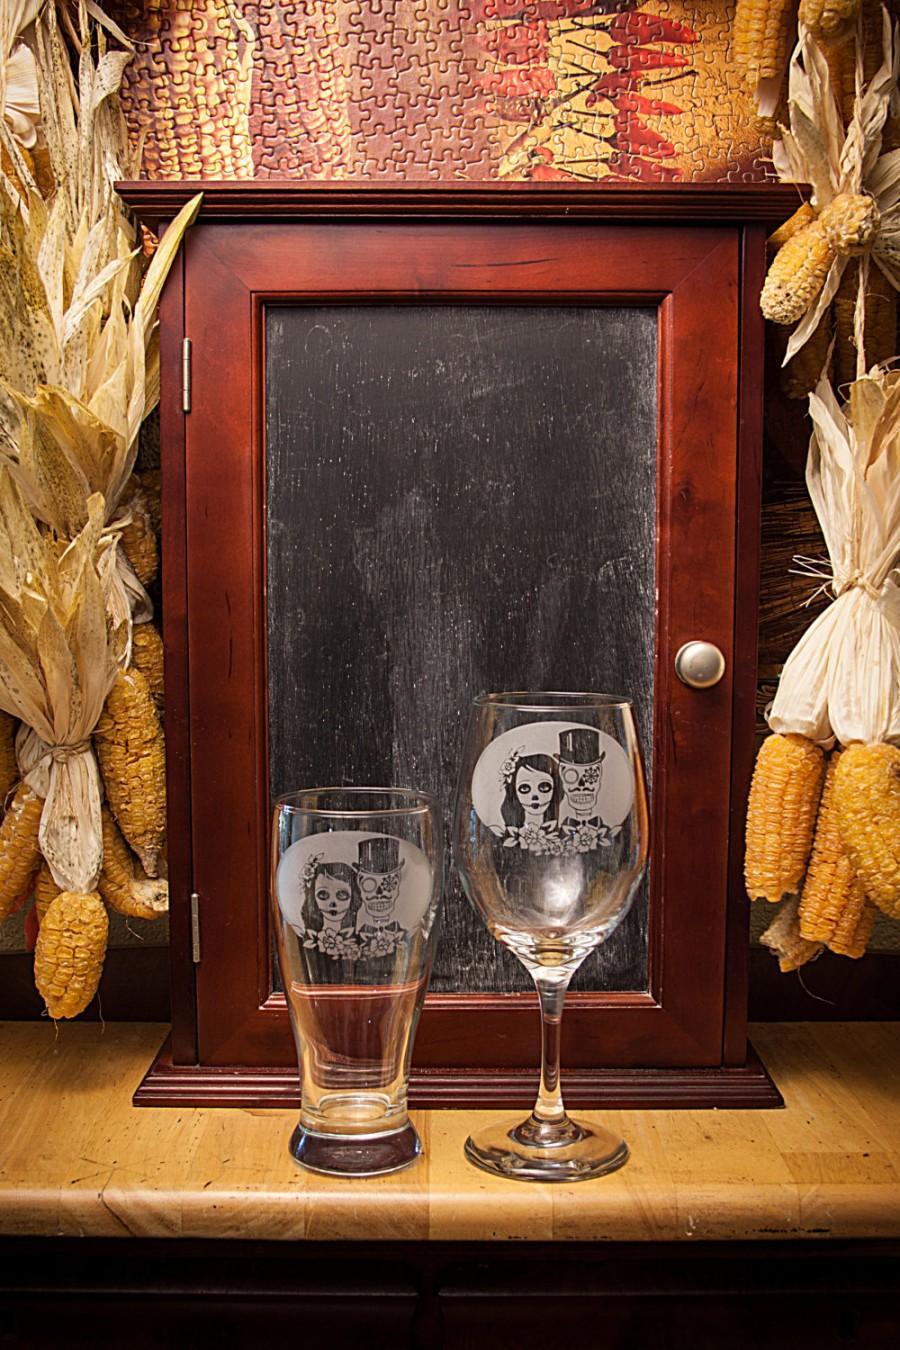 Свадьба - Sugar skull, Day of the dead, off beat bride, Dia de los muertos, Skull wedding, New Mexico, Toasting glasses, By VitalBridalKeepsakes